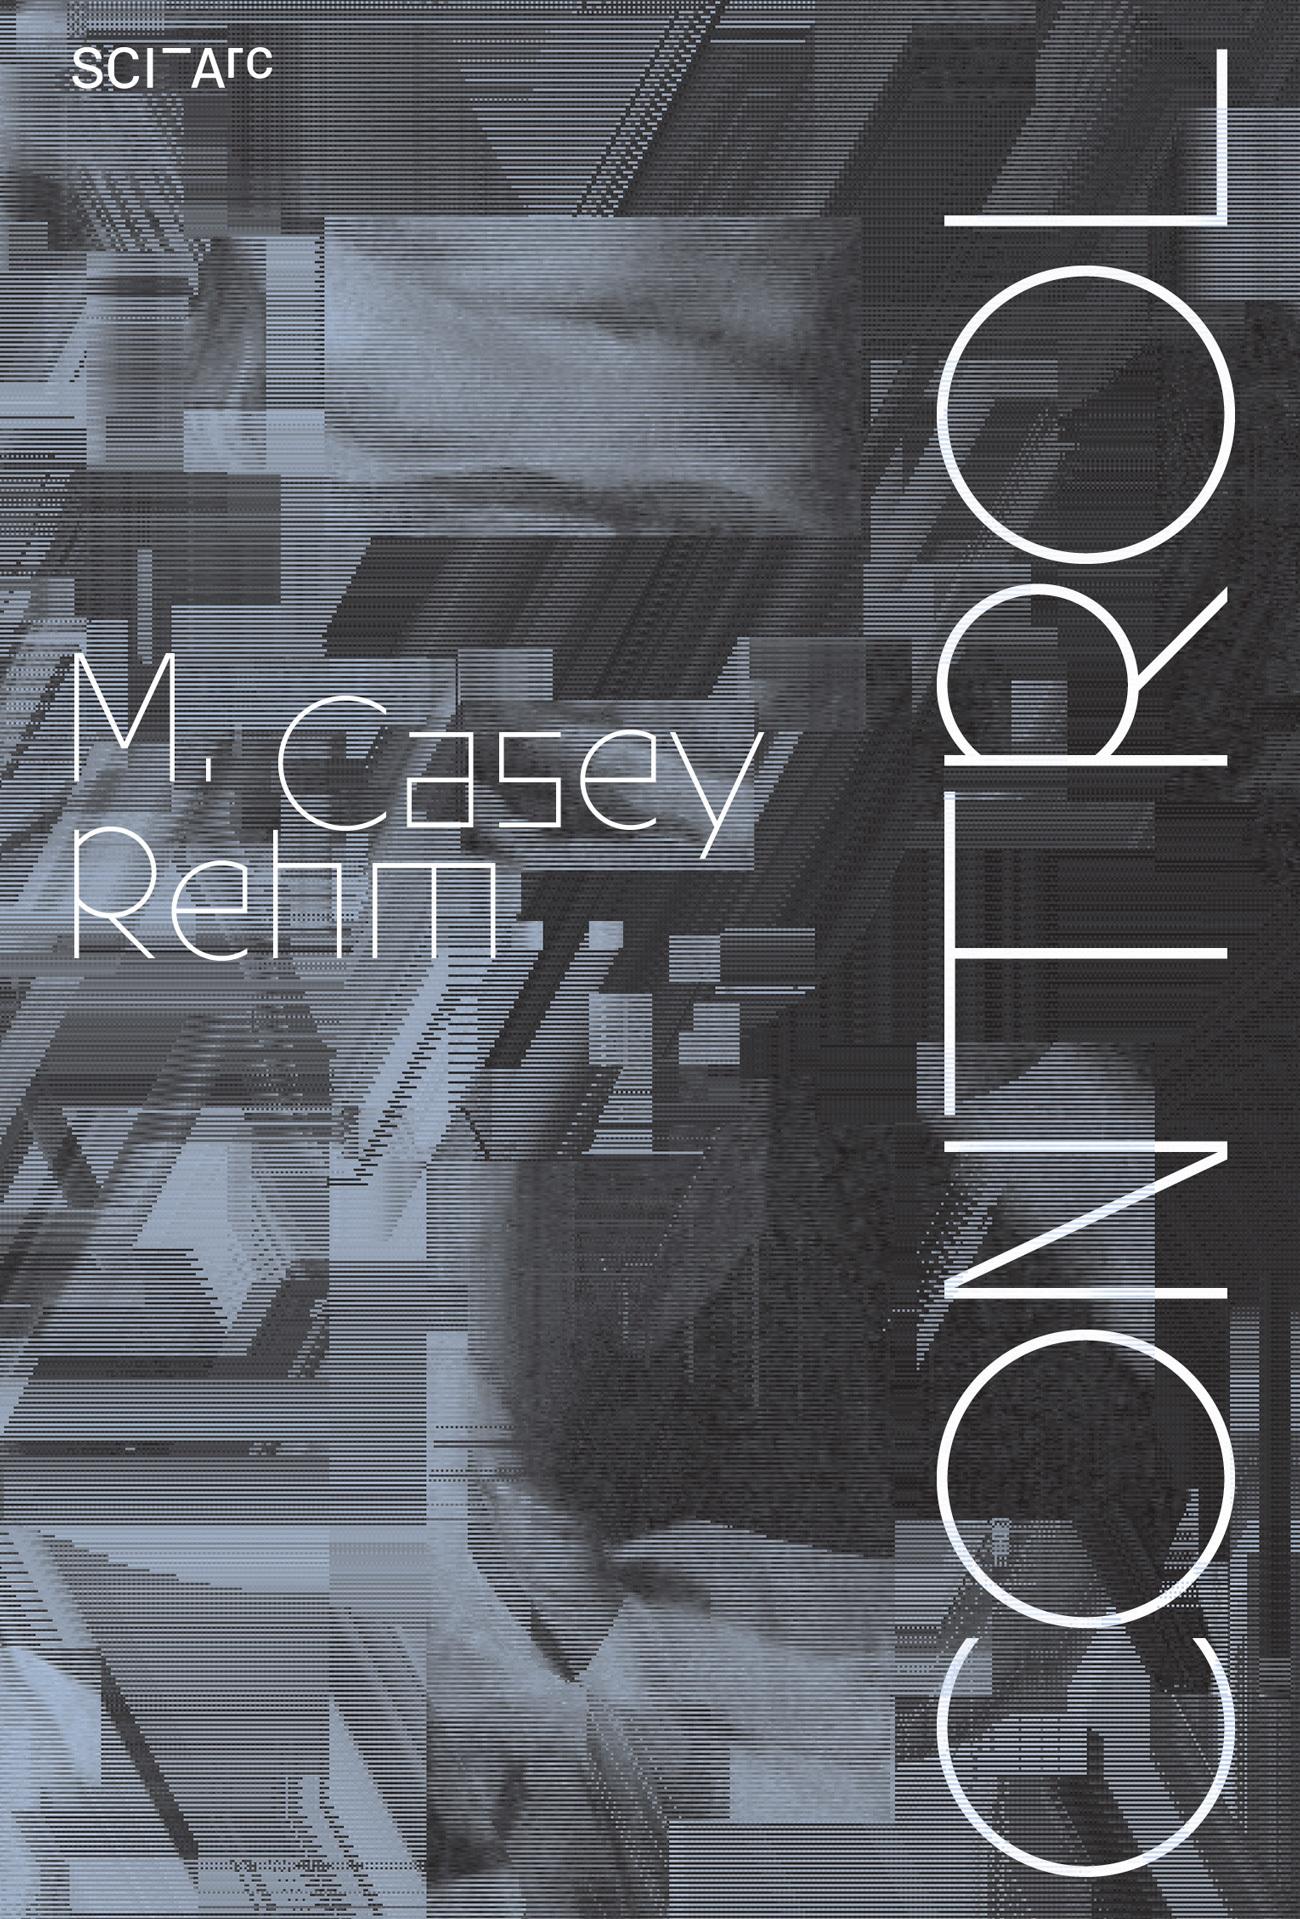 Casey Rehm Sciarc gallery exhibition poster